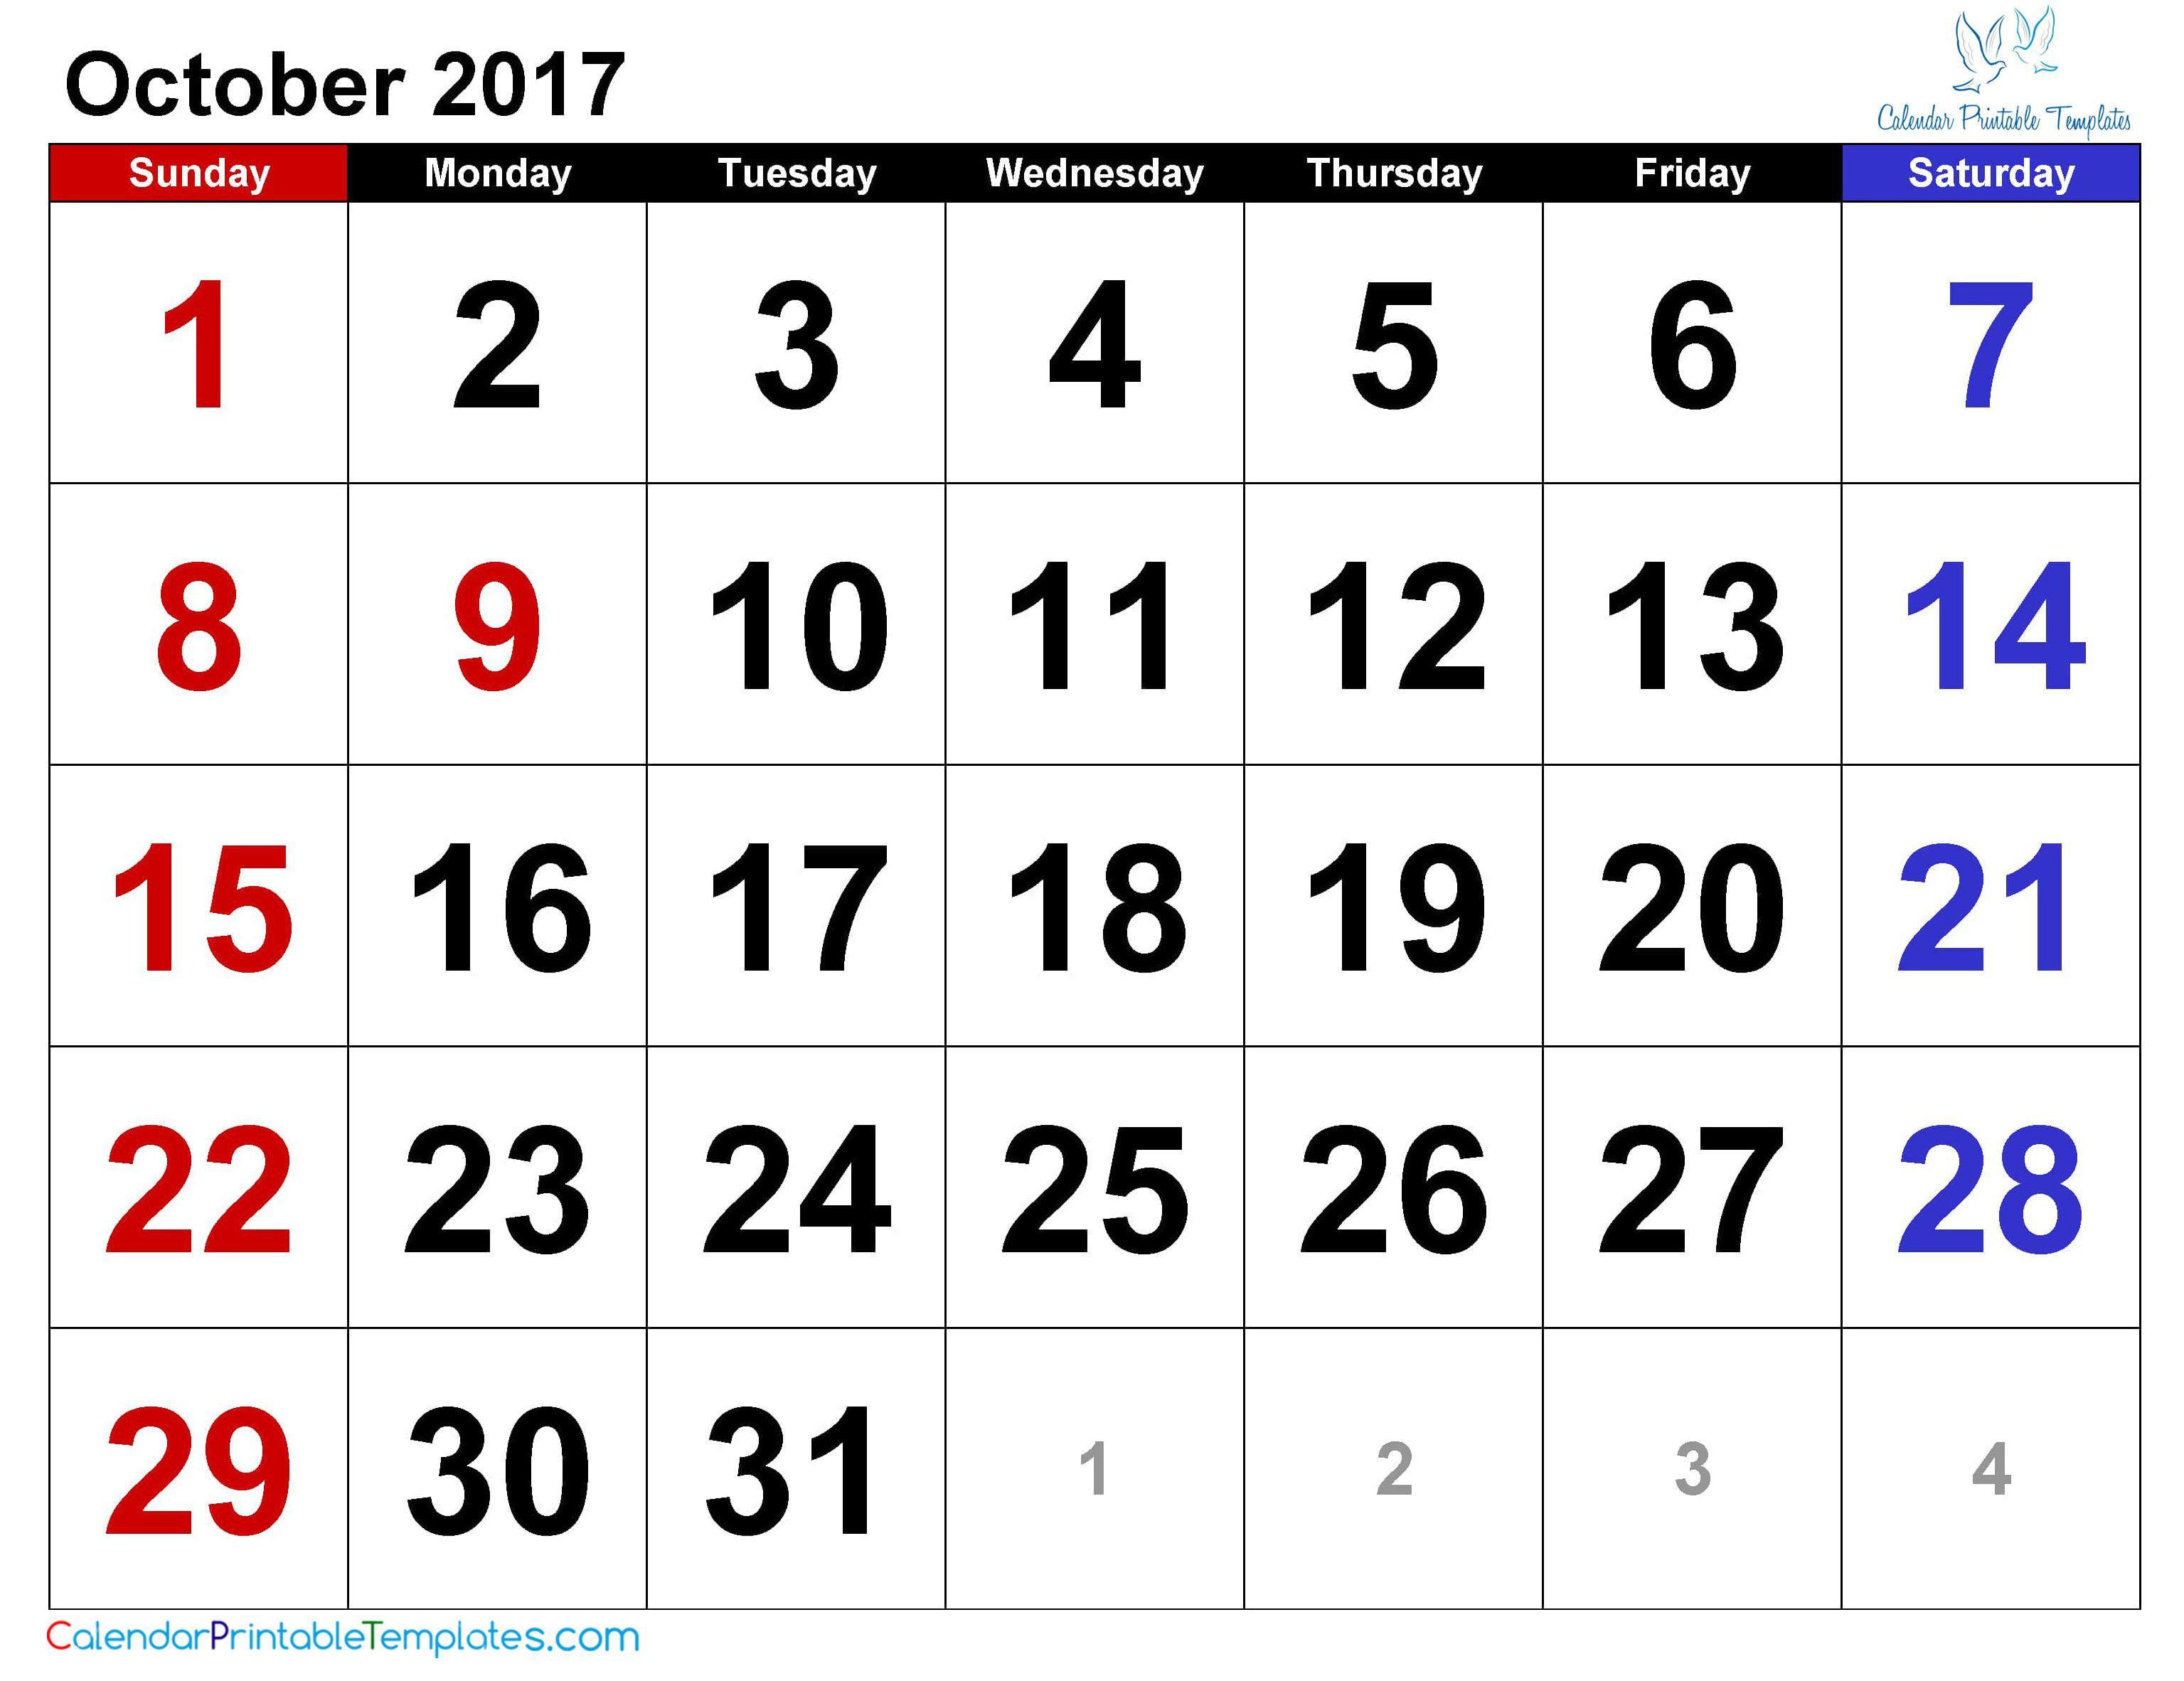 October 2018 Calendar Printable Template Pdf Uk Usa Canada